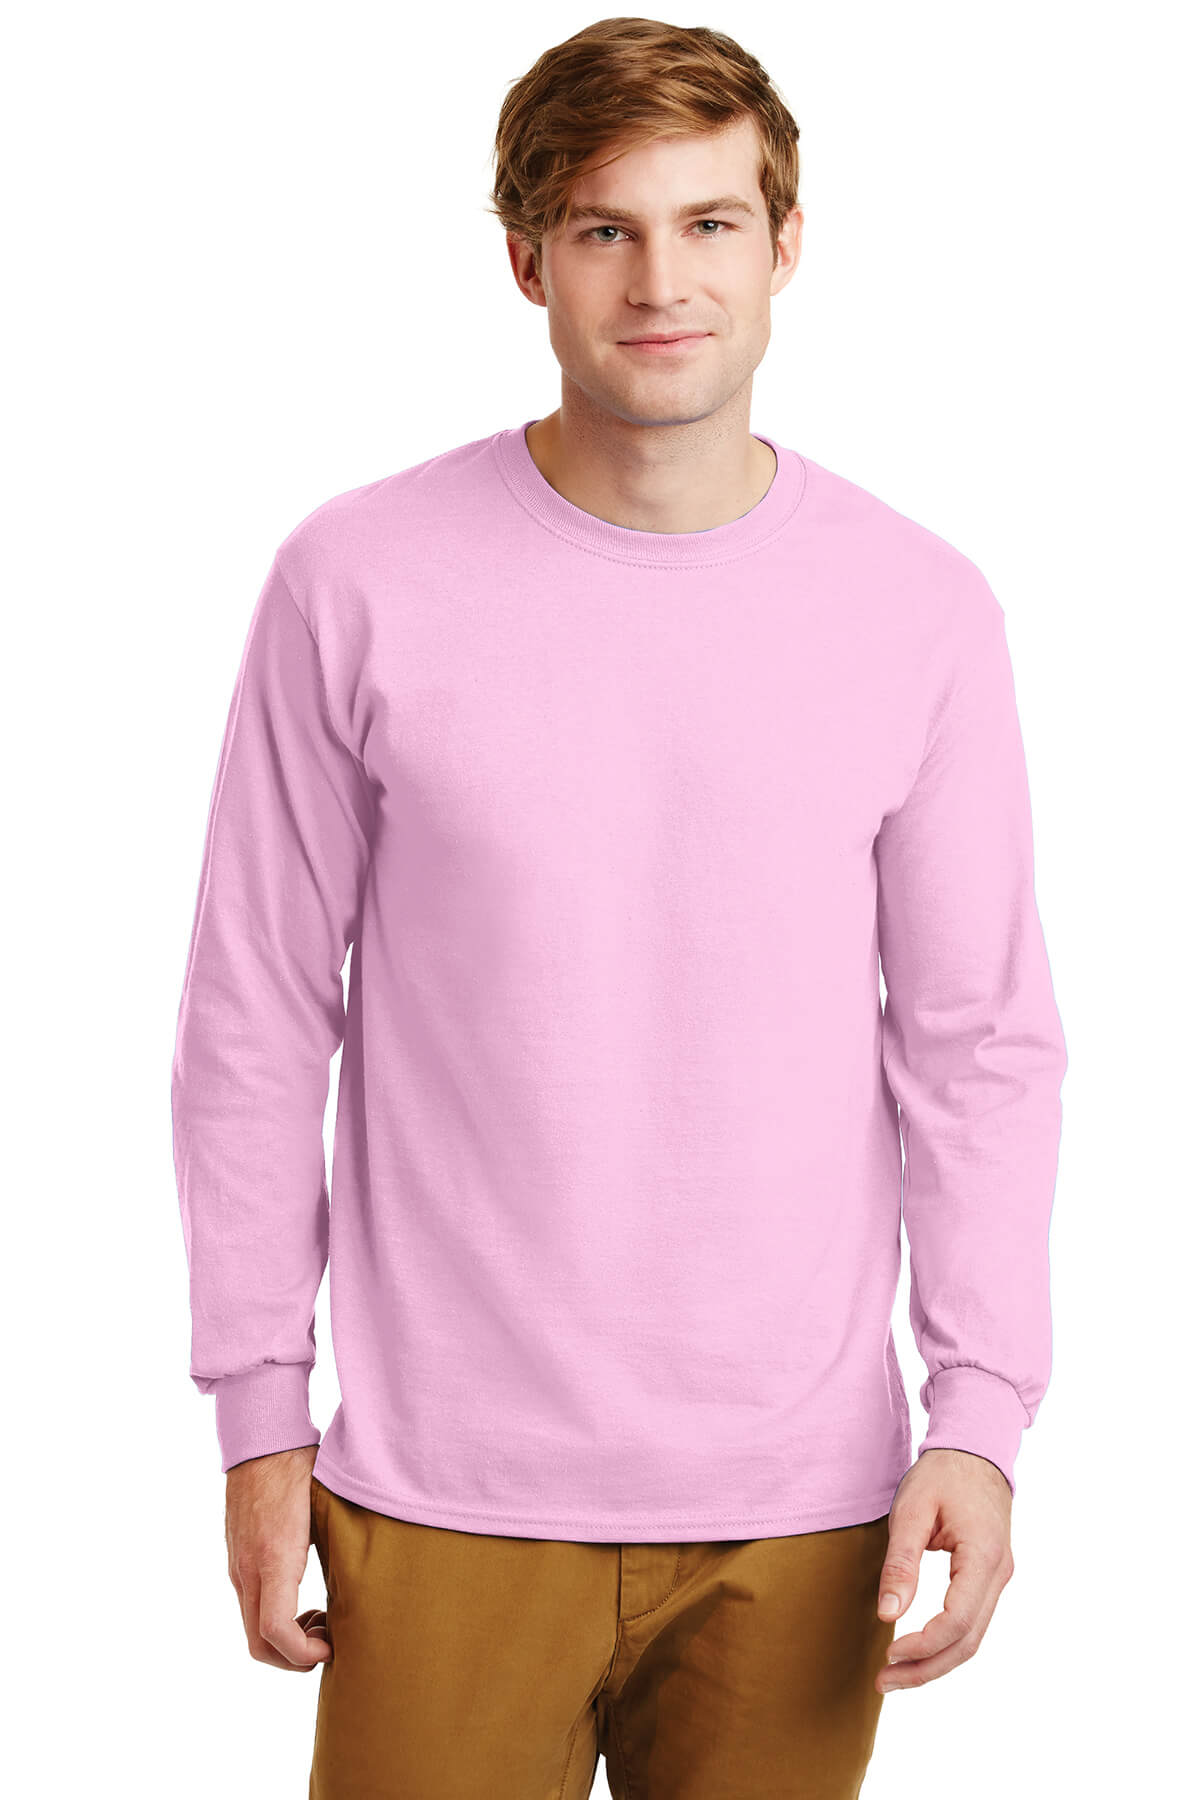 g2400-light-pink-2